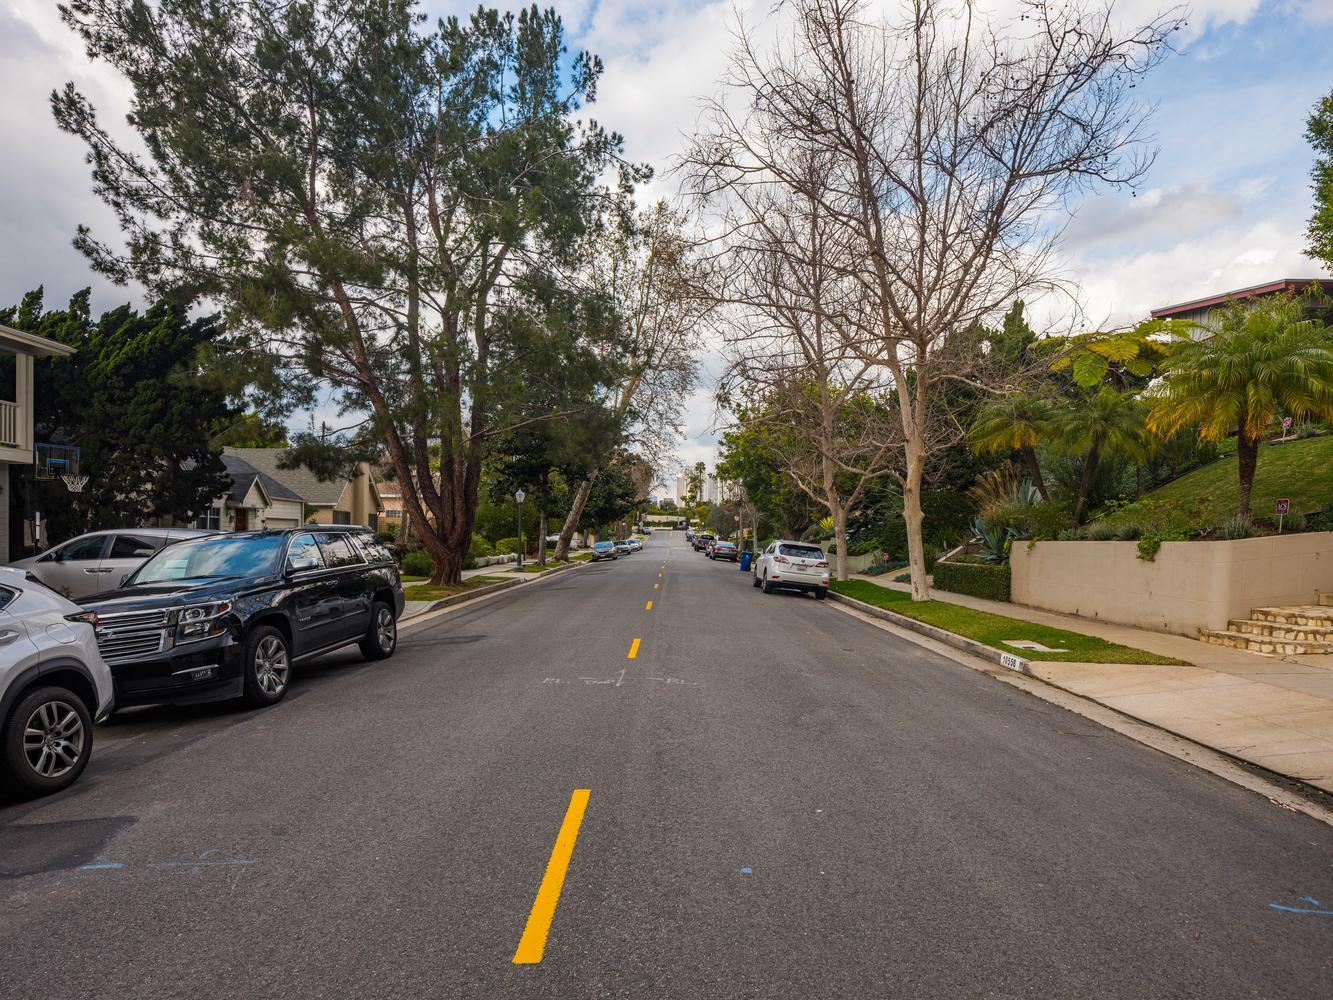 10558 Putney Rd Los Angeles CA-large-033-5-Exterior-1334x1000-72dpi.jpg